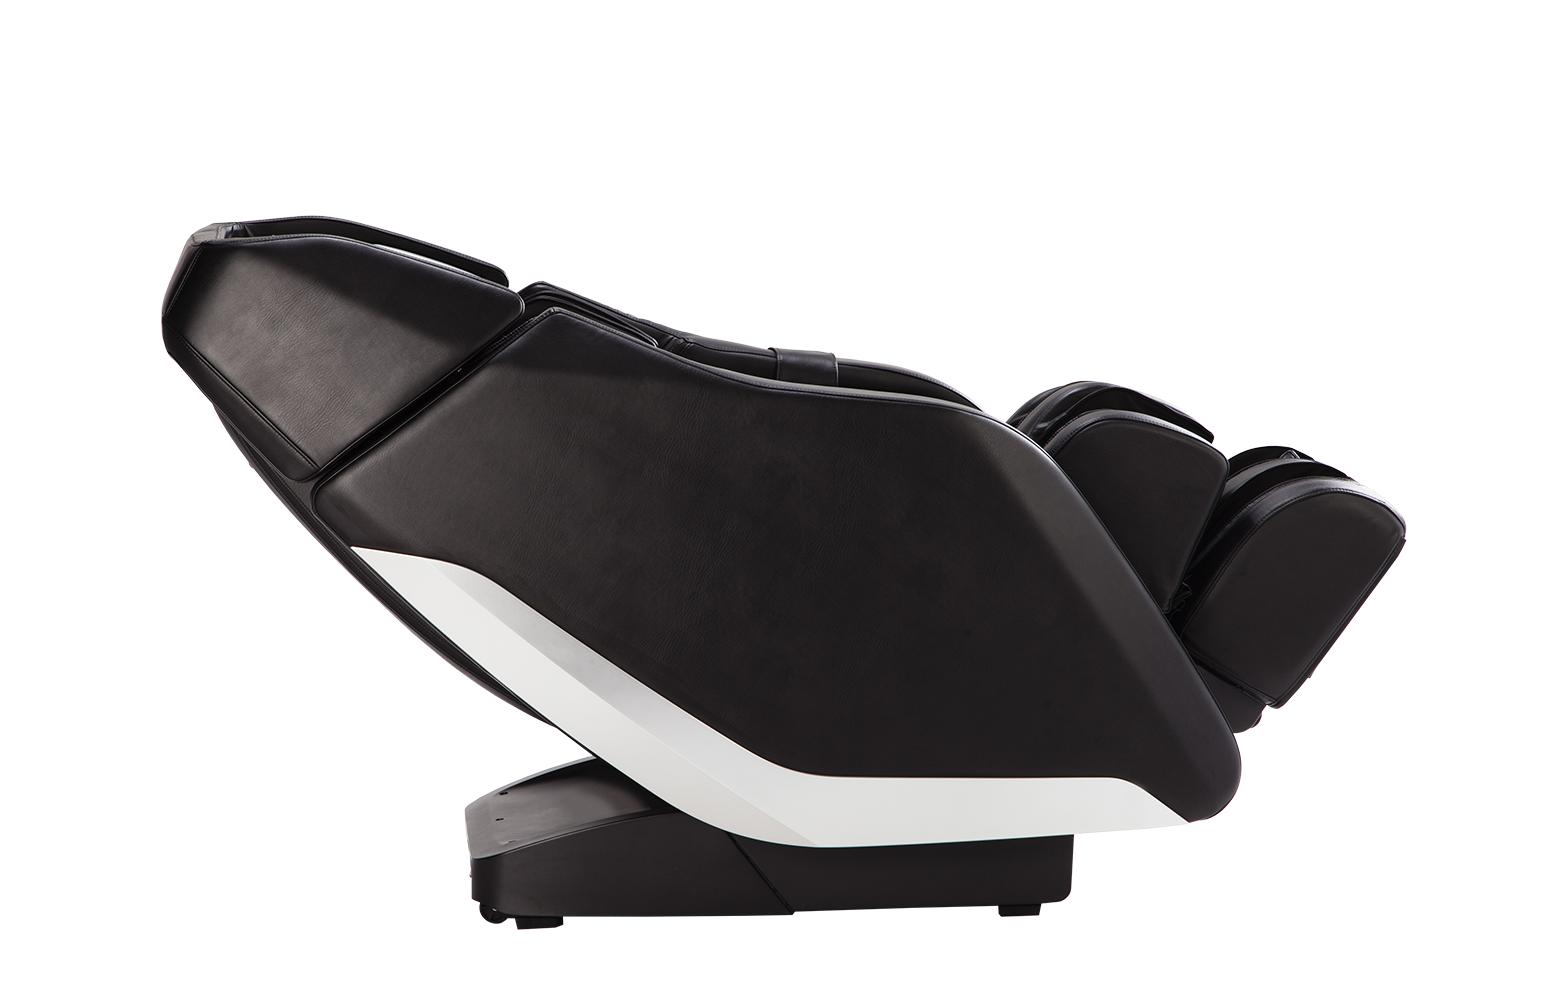 Pegasus Massage Chair